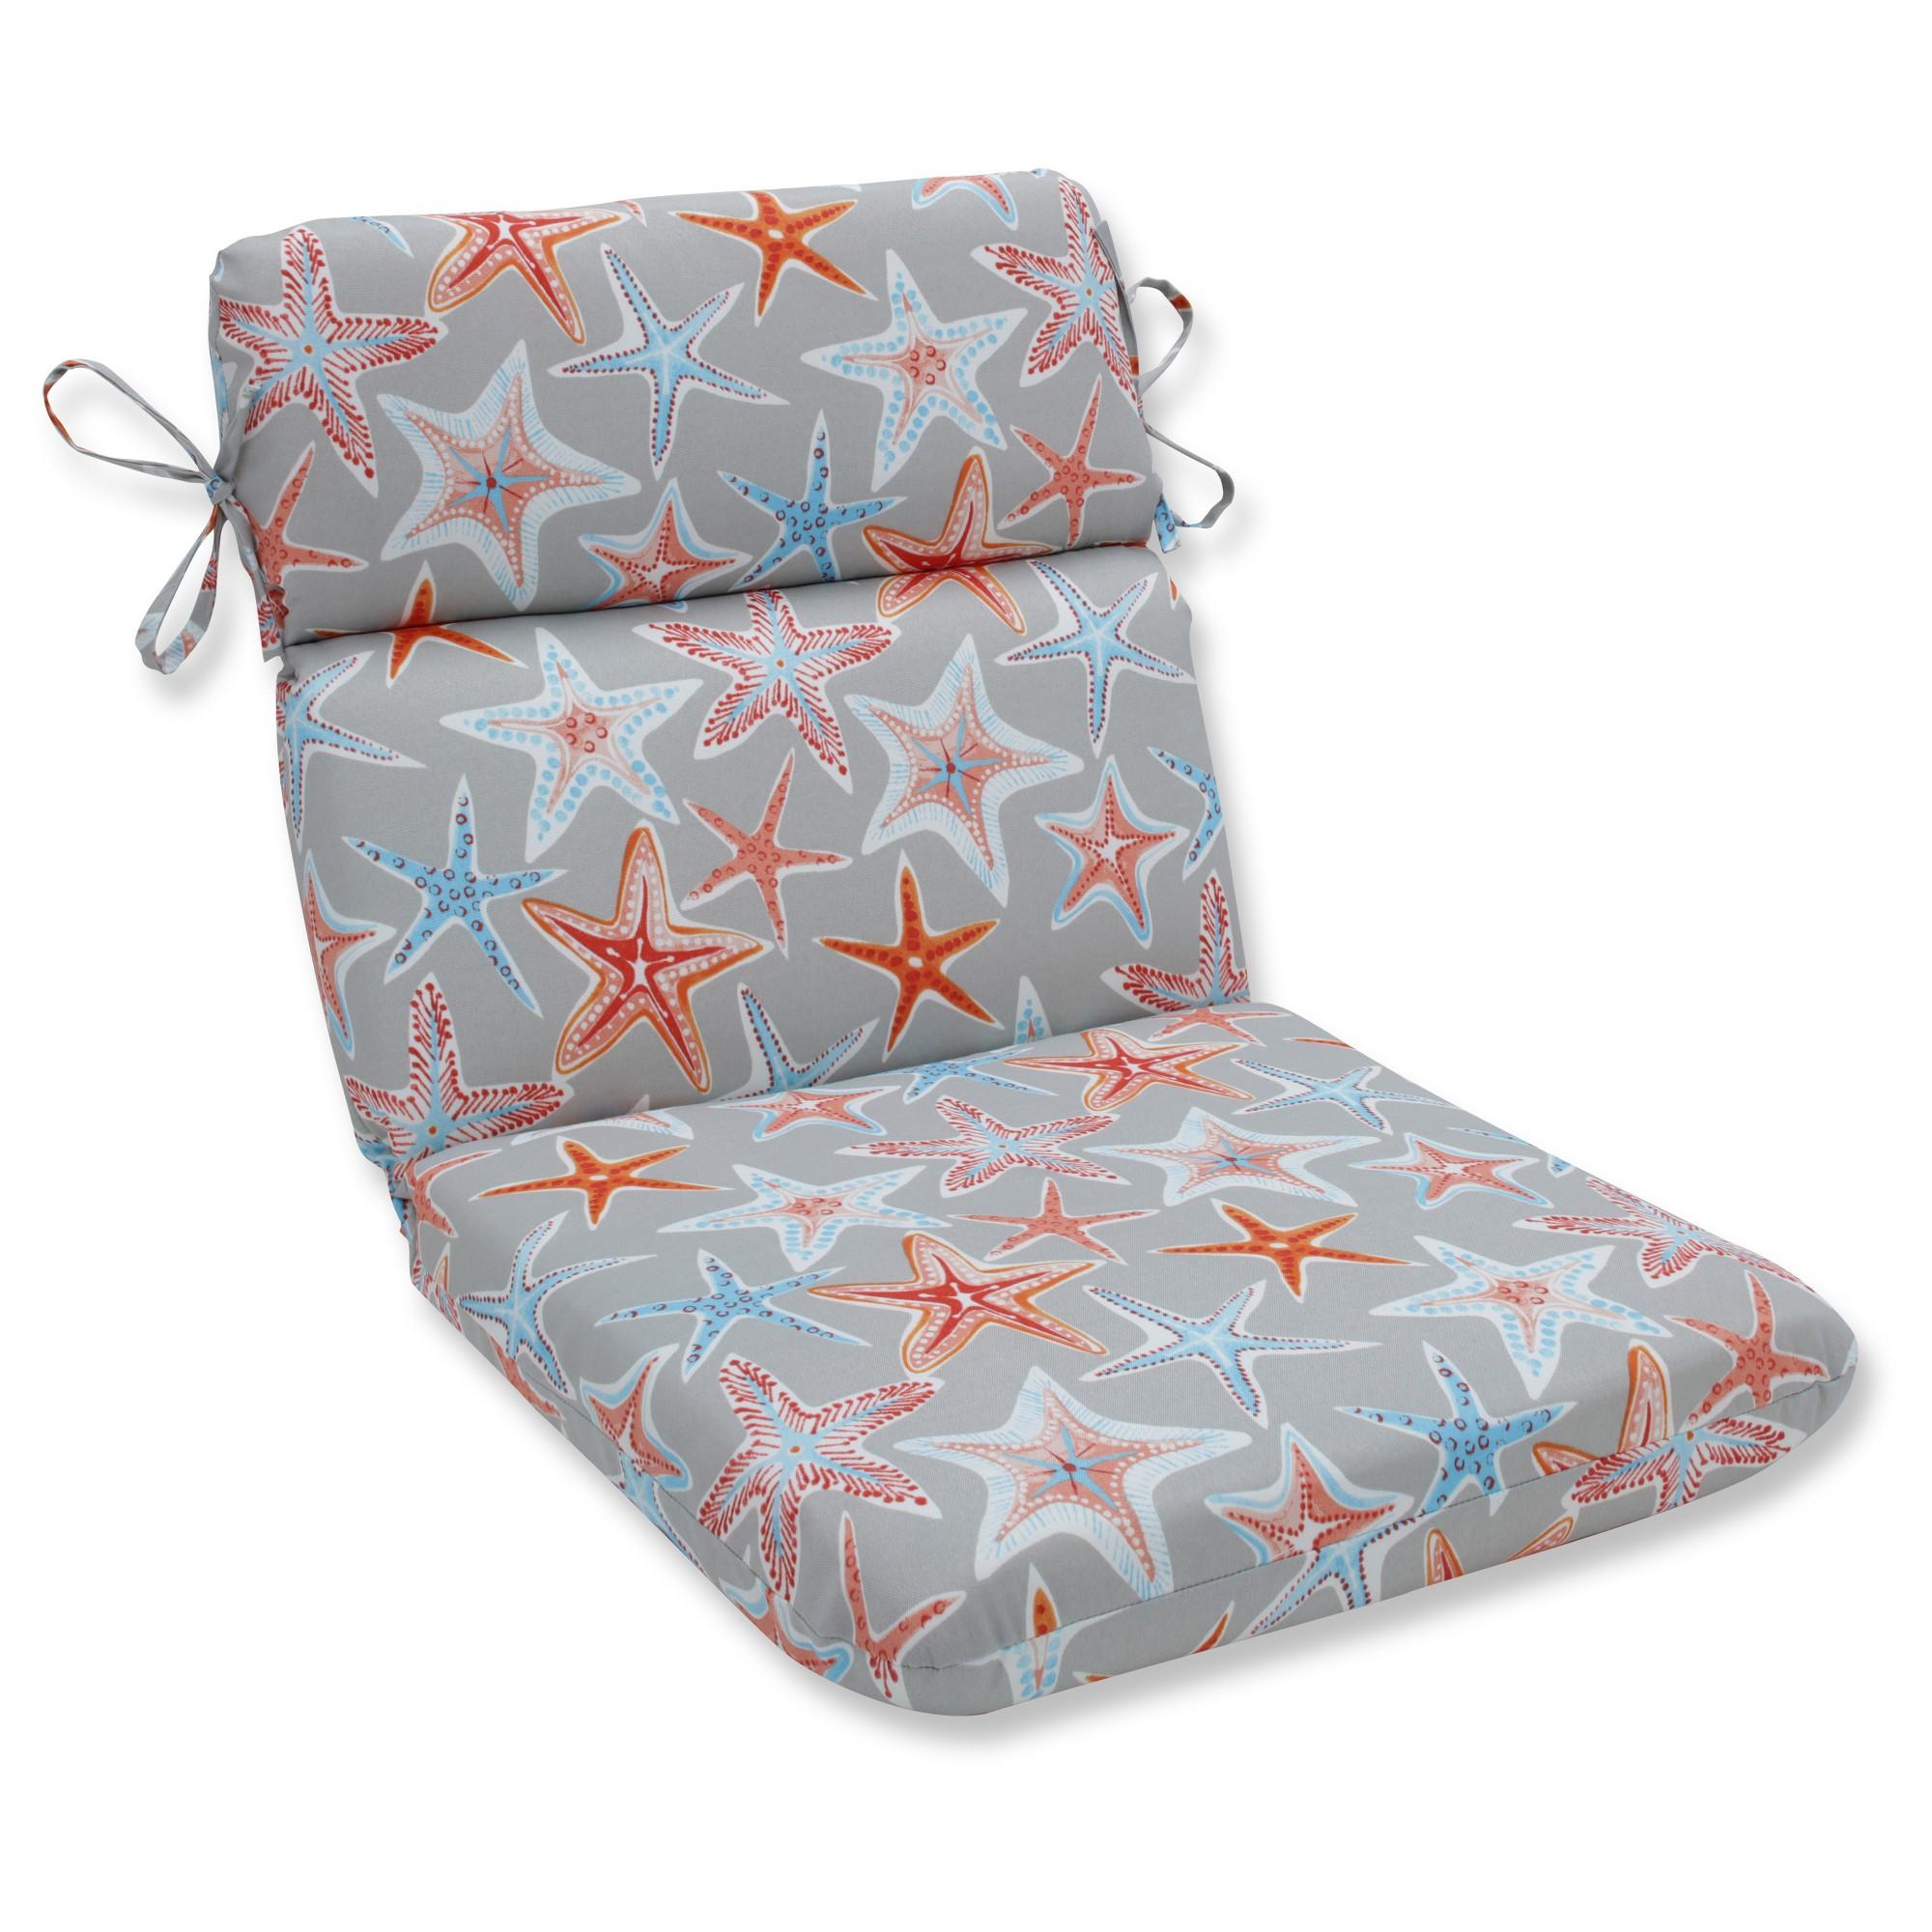 Outdoor/Indoor Stars Collide Gray Rounded Corners Chair